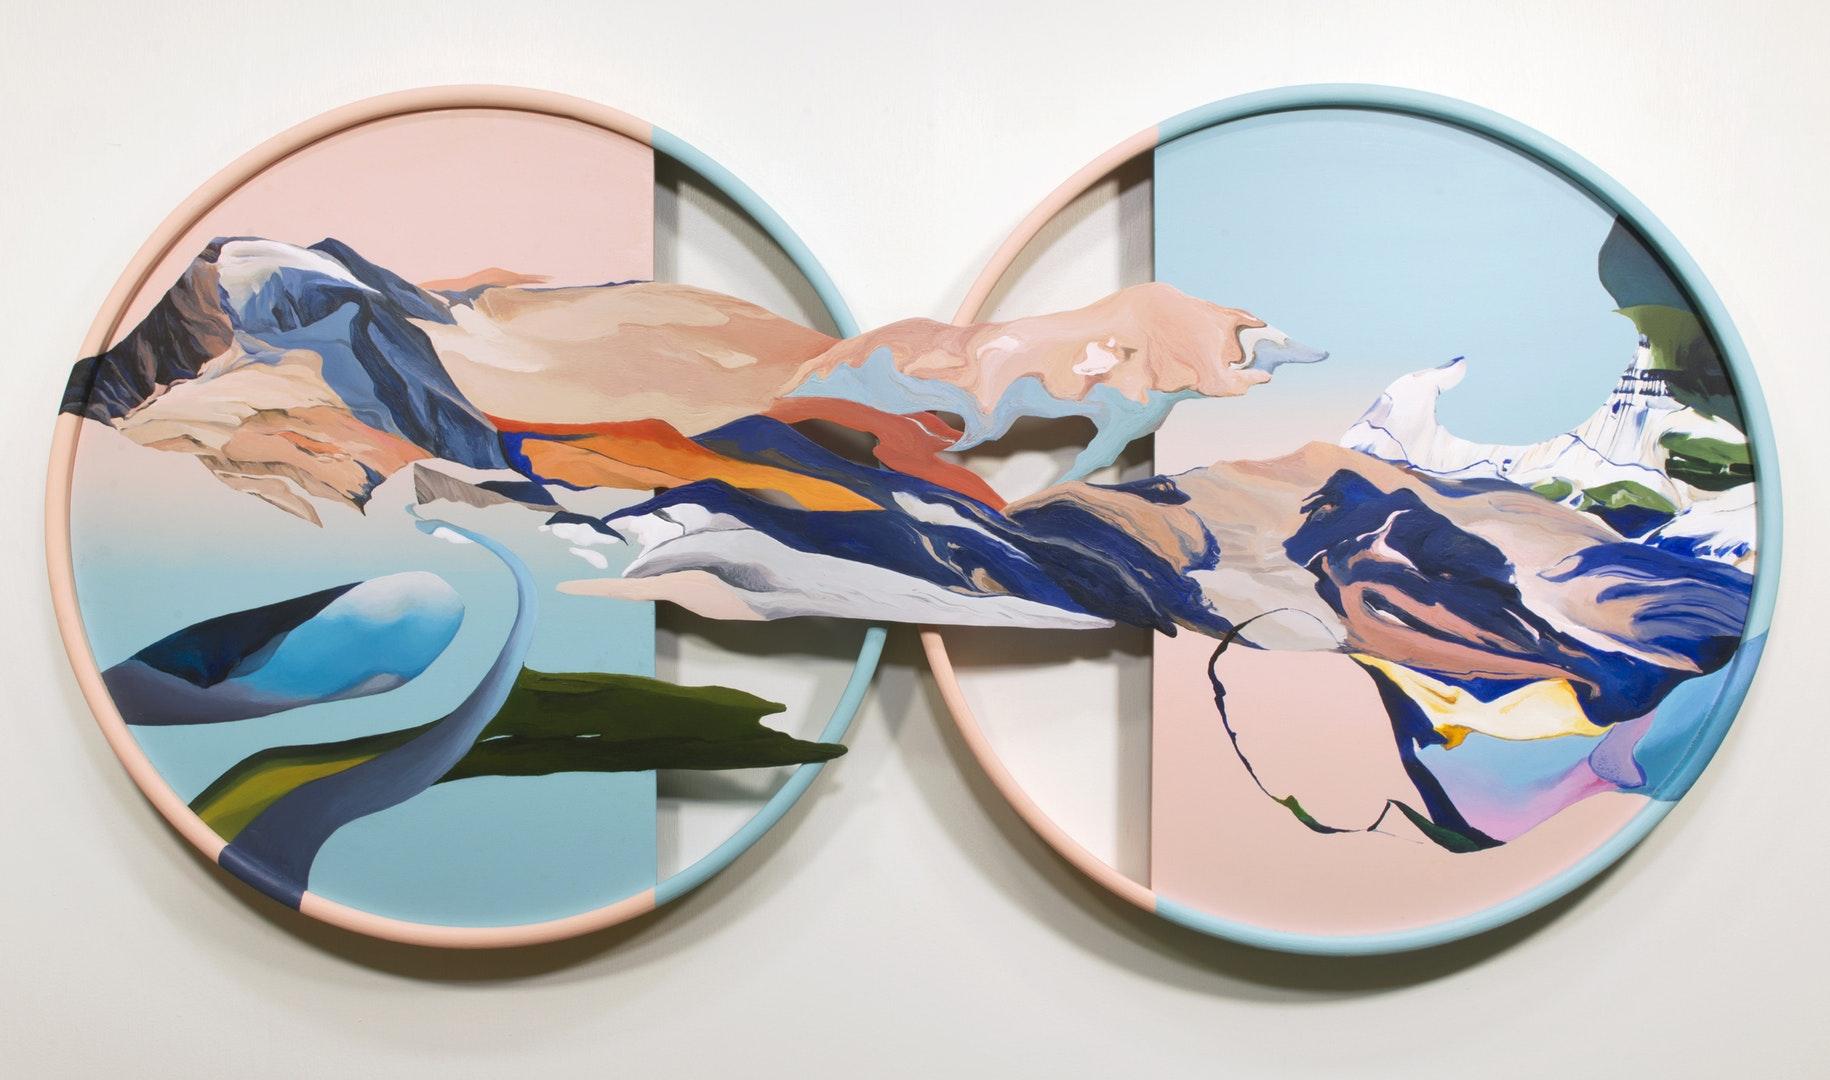 Ziling Wang  An ordinary alternation between sun and moon  Acrylic on wood panel, 50 x 100 x 4 cm  http://www.wangziling.co.uk